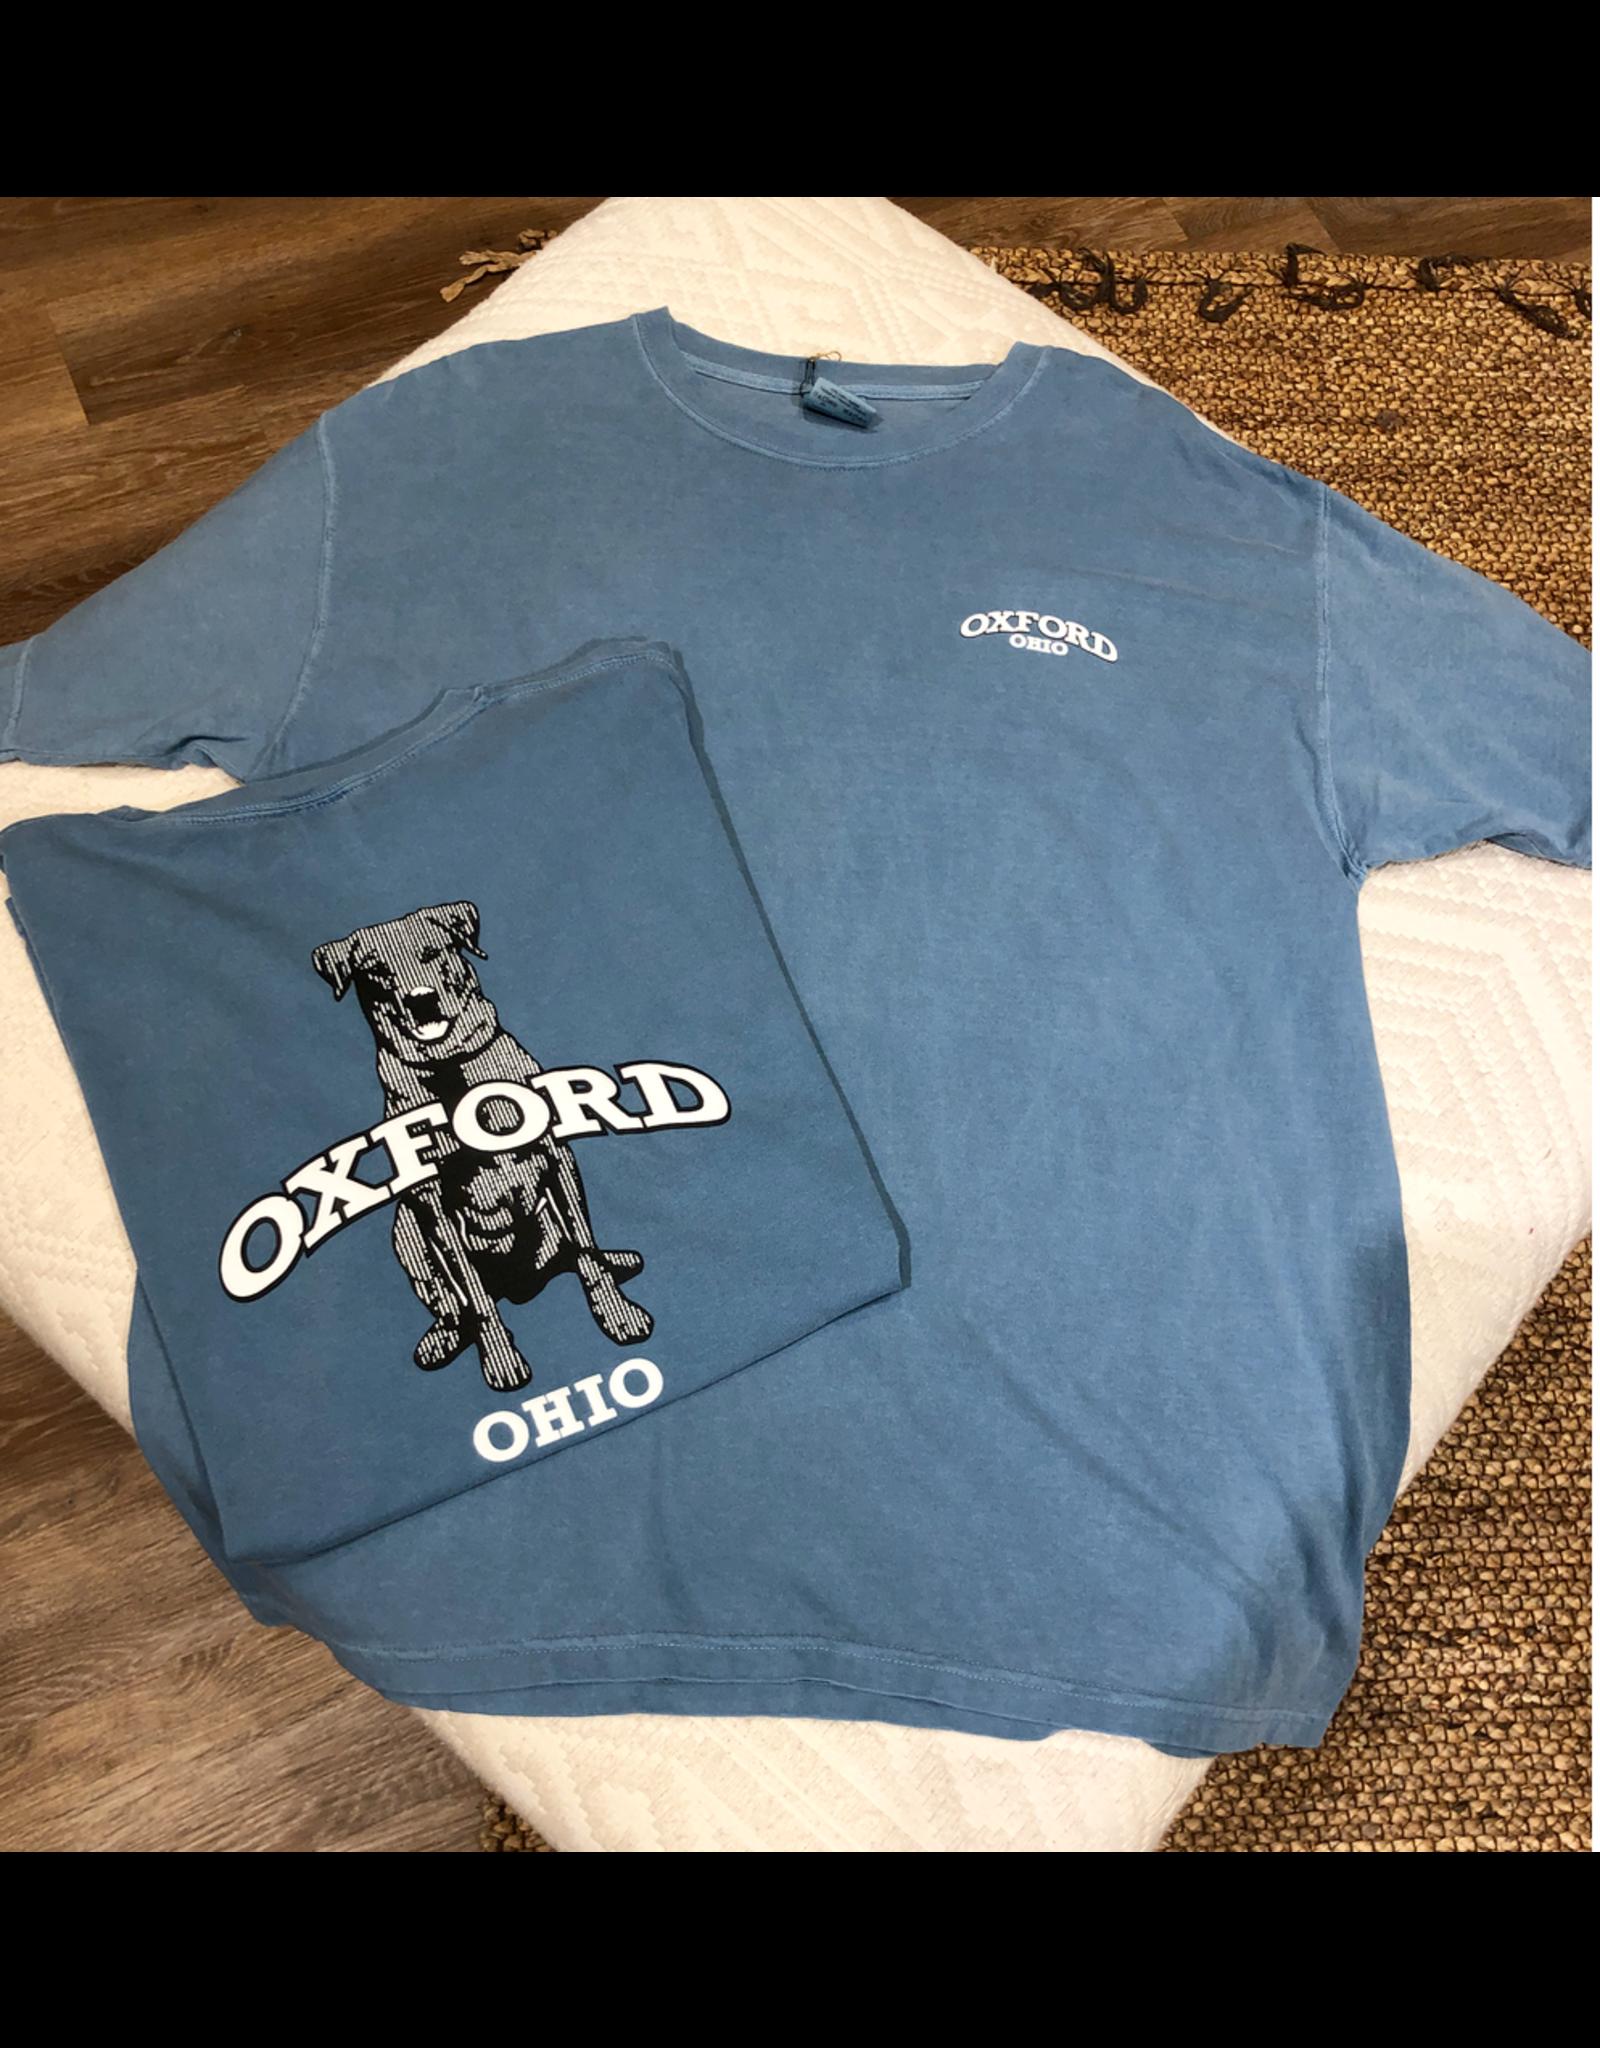 "Oxford"" SS Tee"